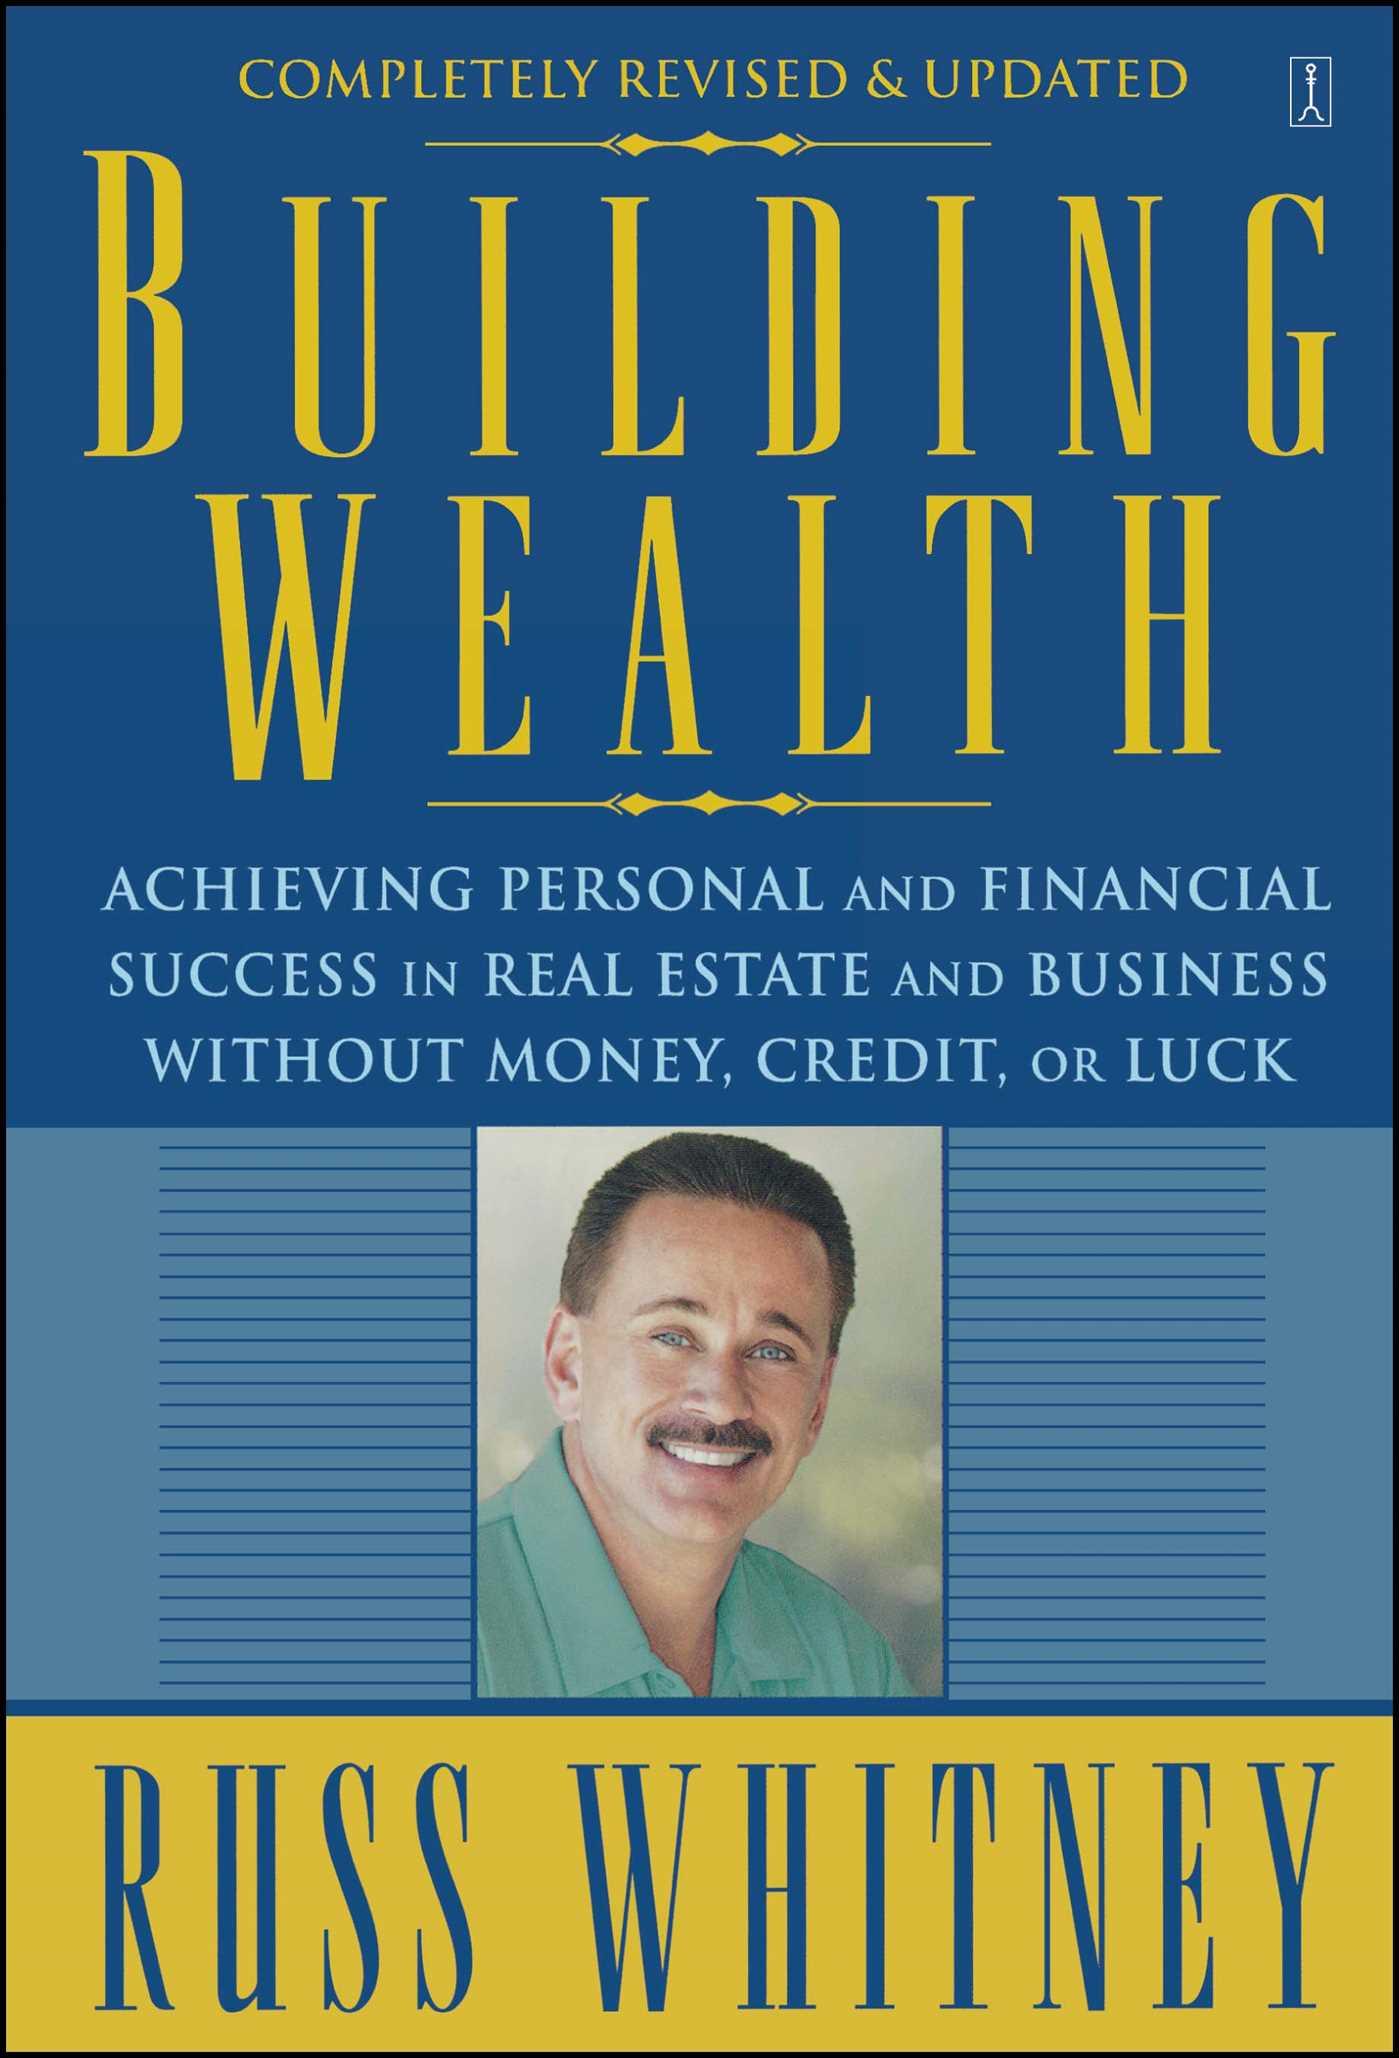 Building wealth 9780743291613 hr